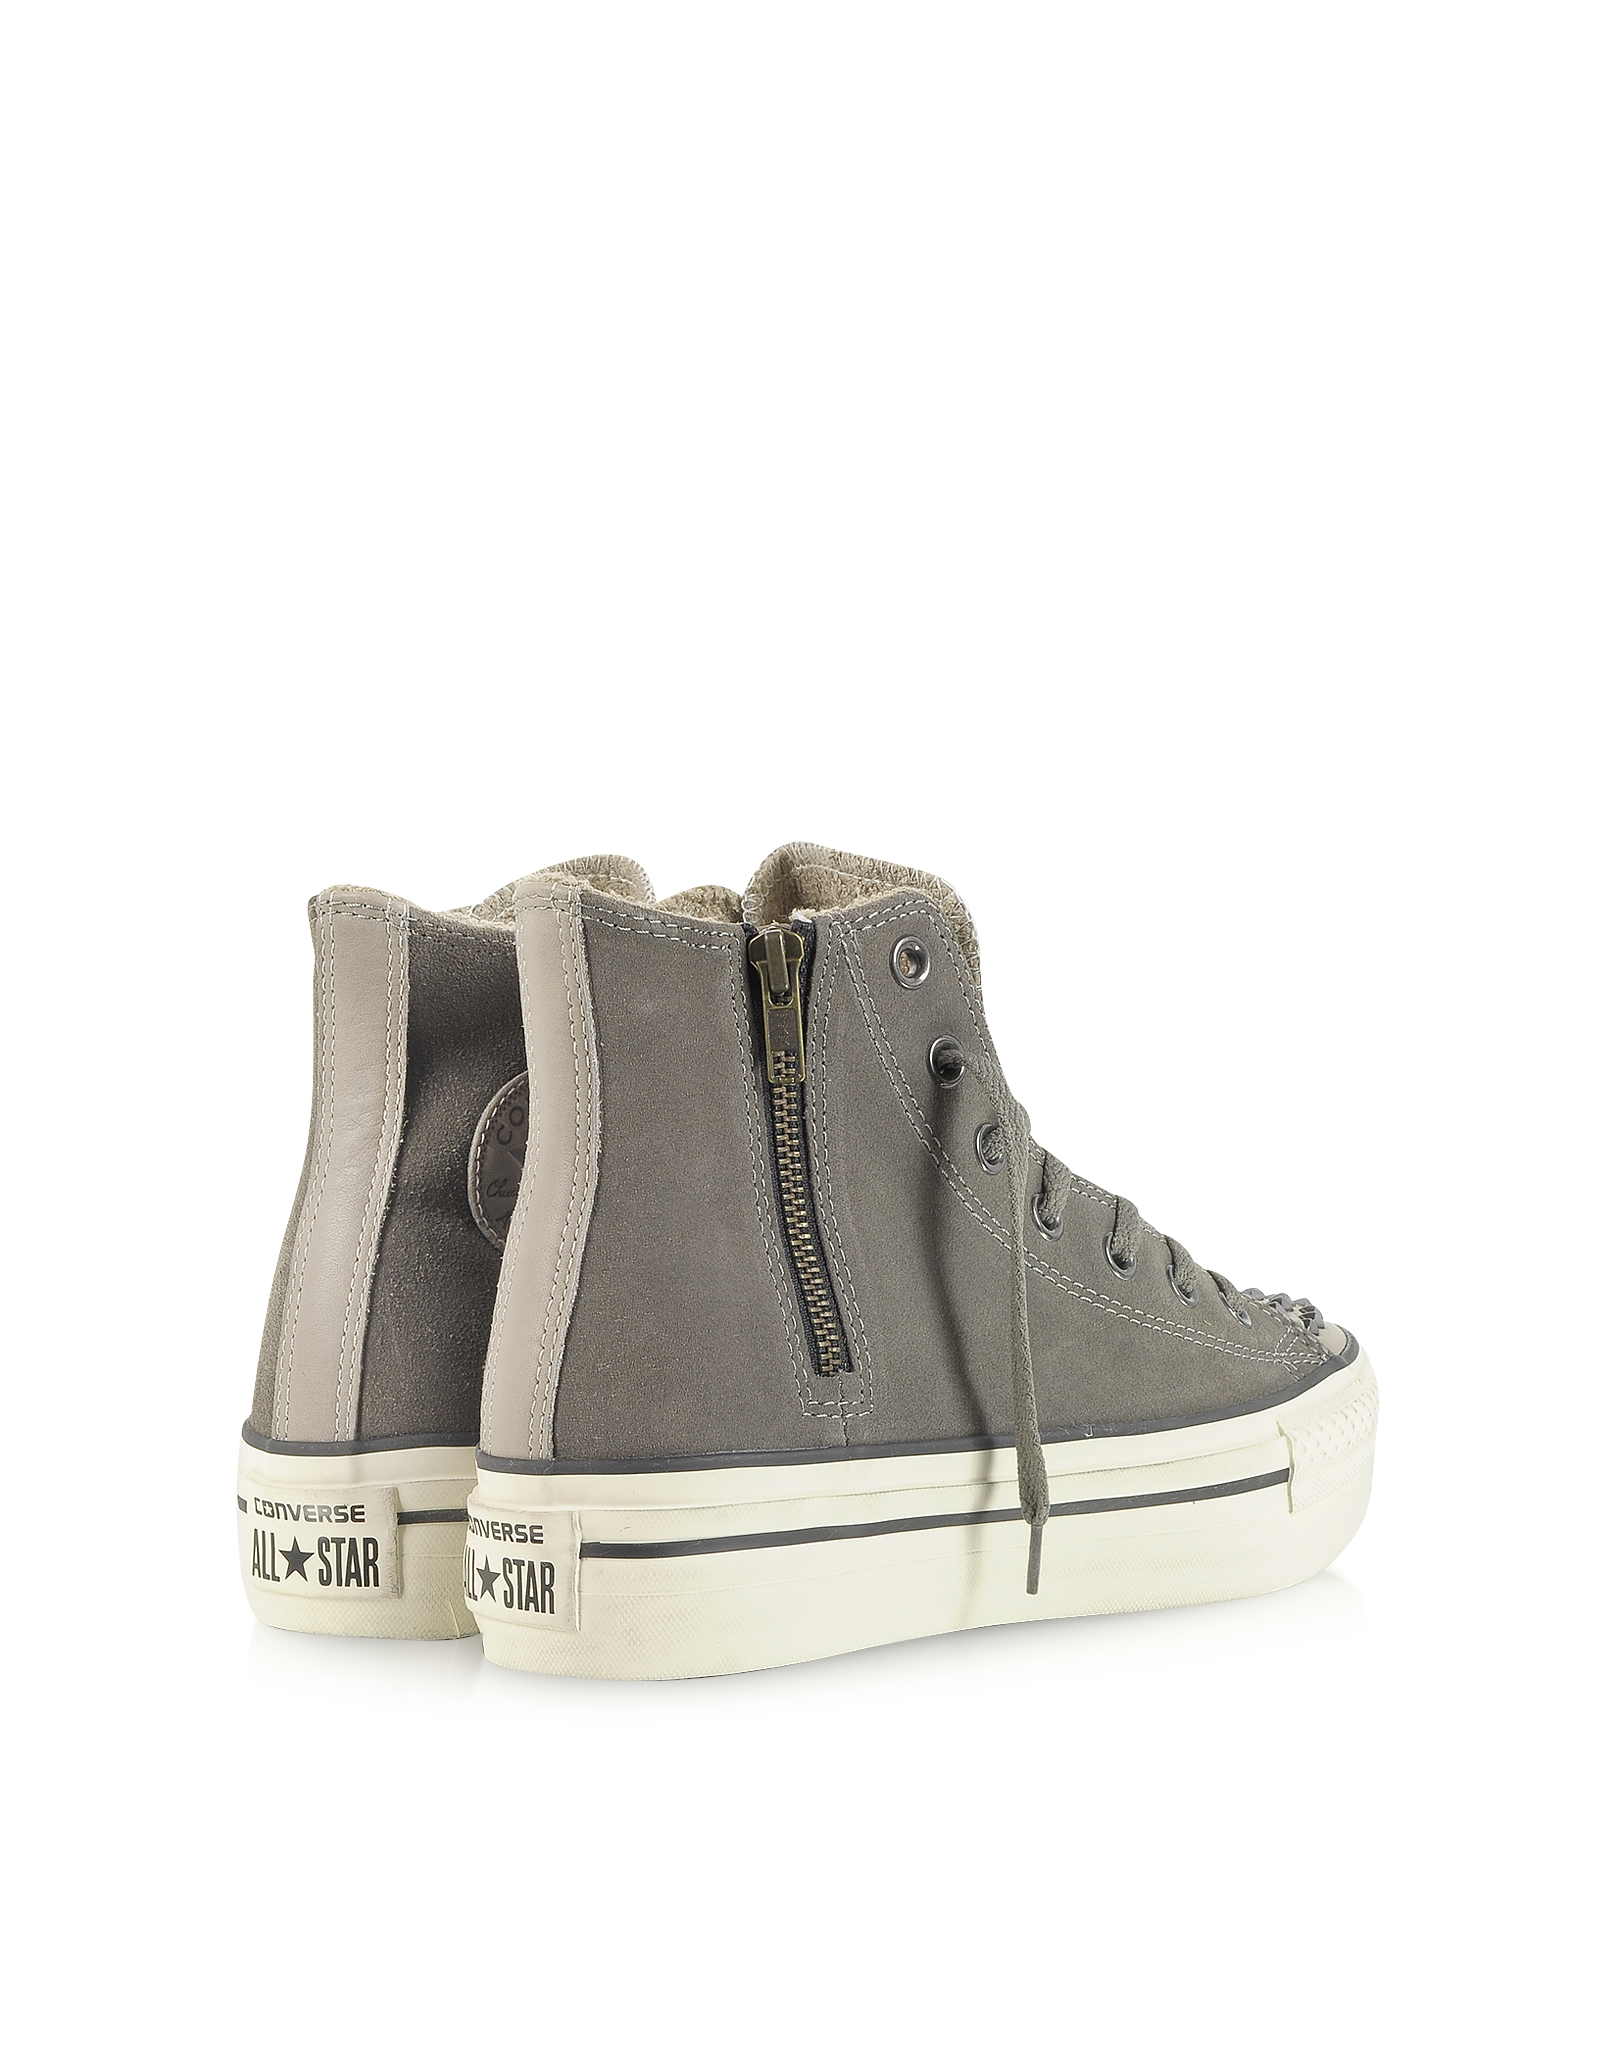 1b34a6fdf57c Lyst - Converse Ct Platform Zip   Stud Suede High Top Sneaker in Gray